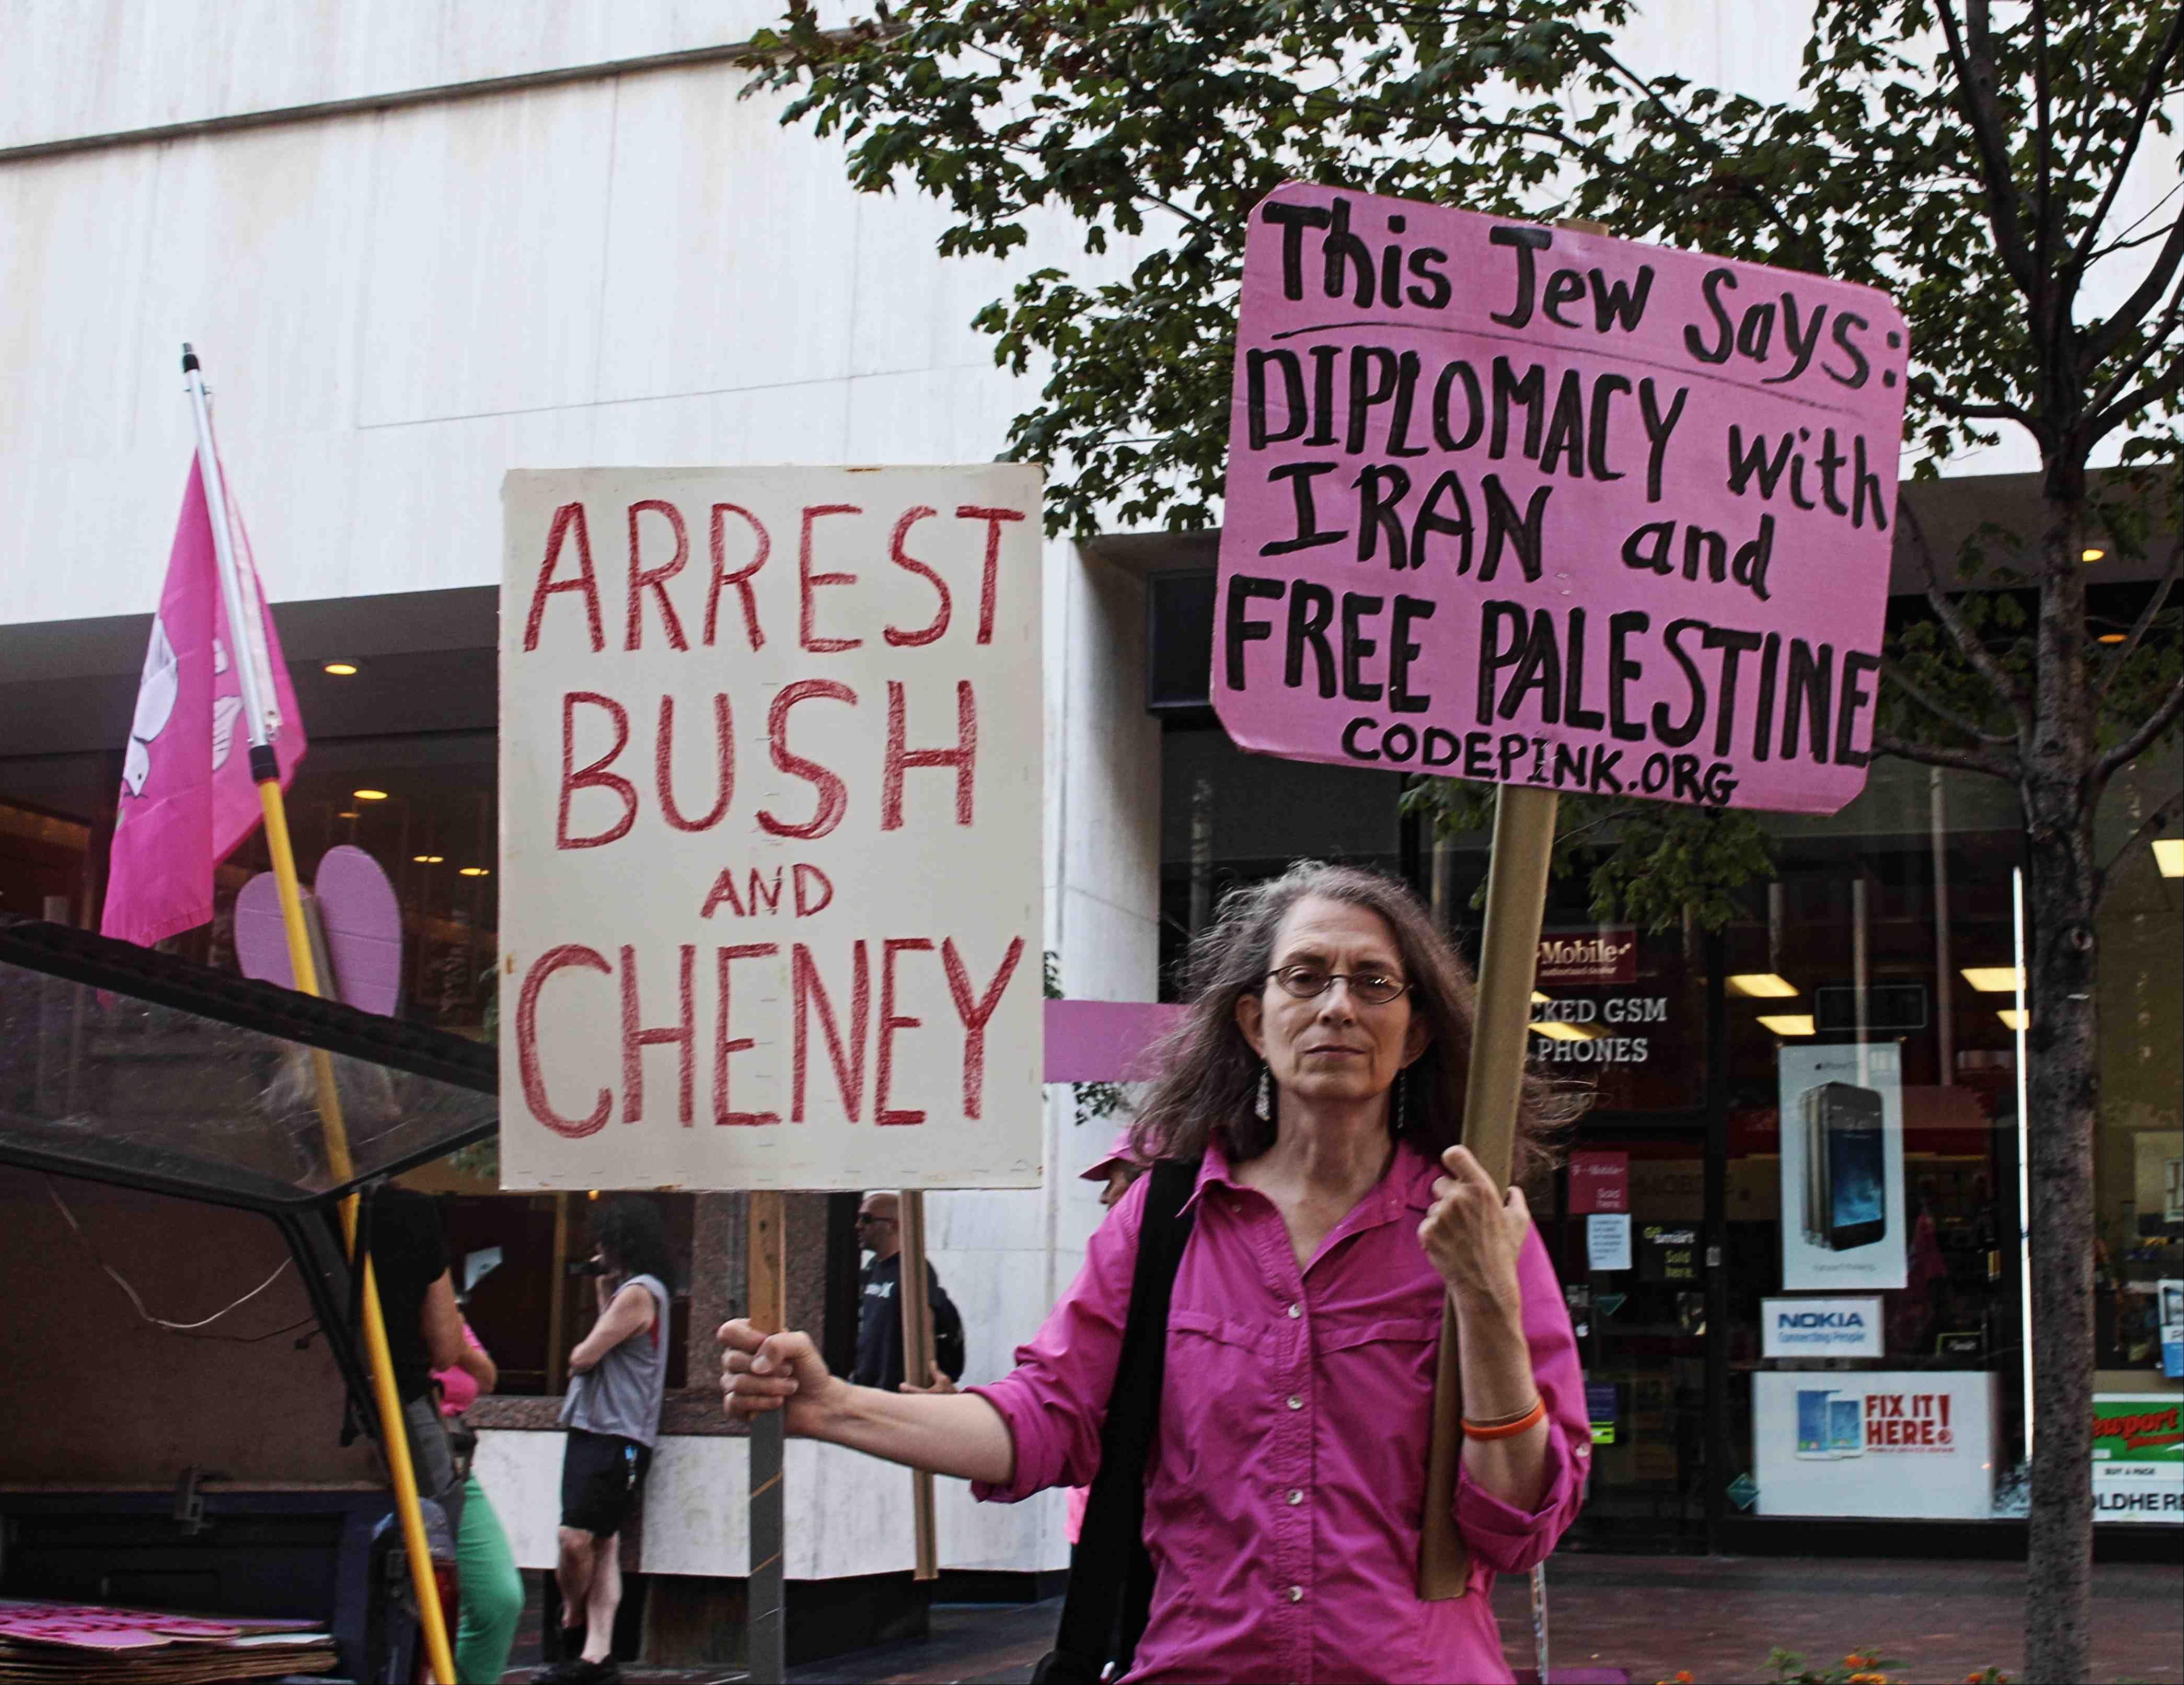 prosecute a torturer Cheney